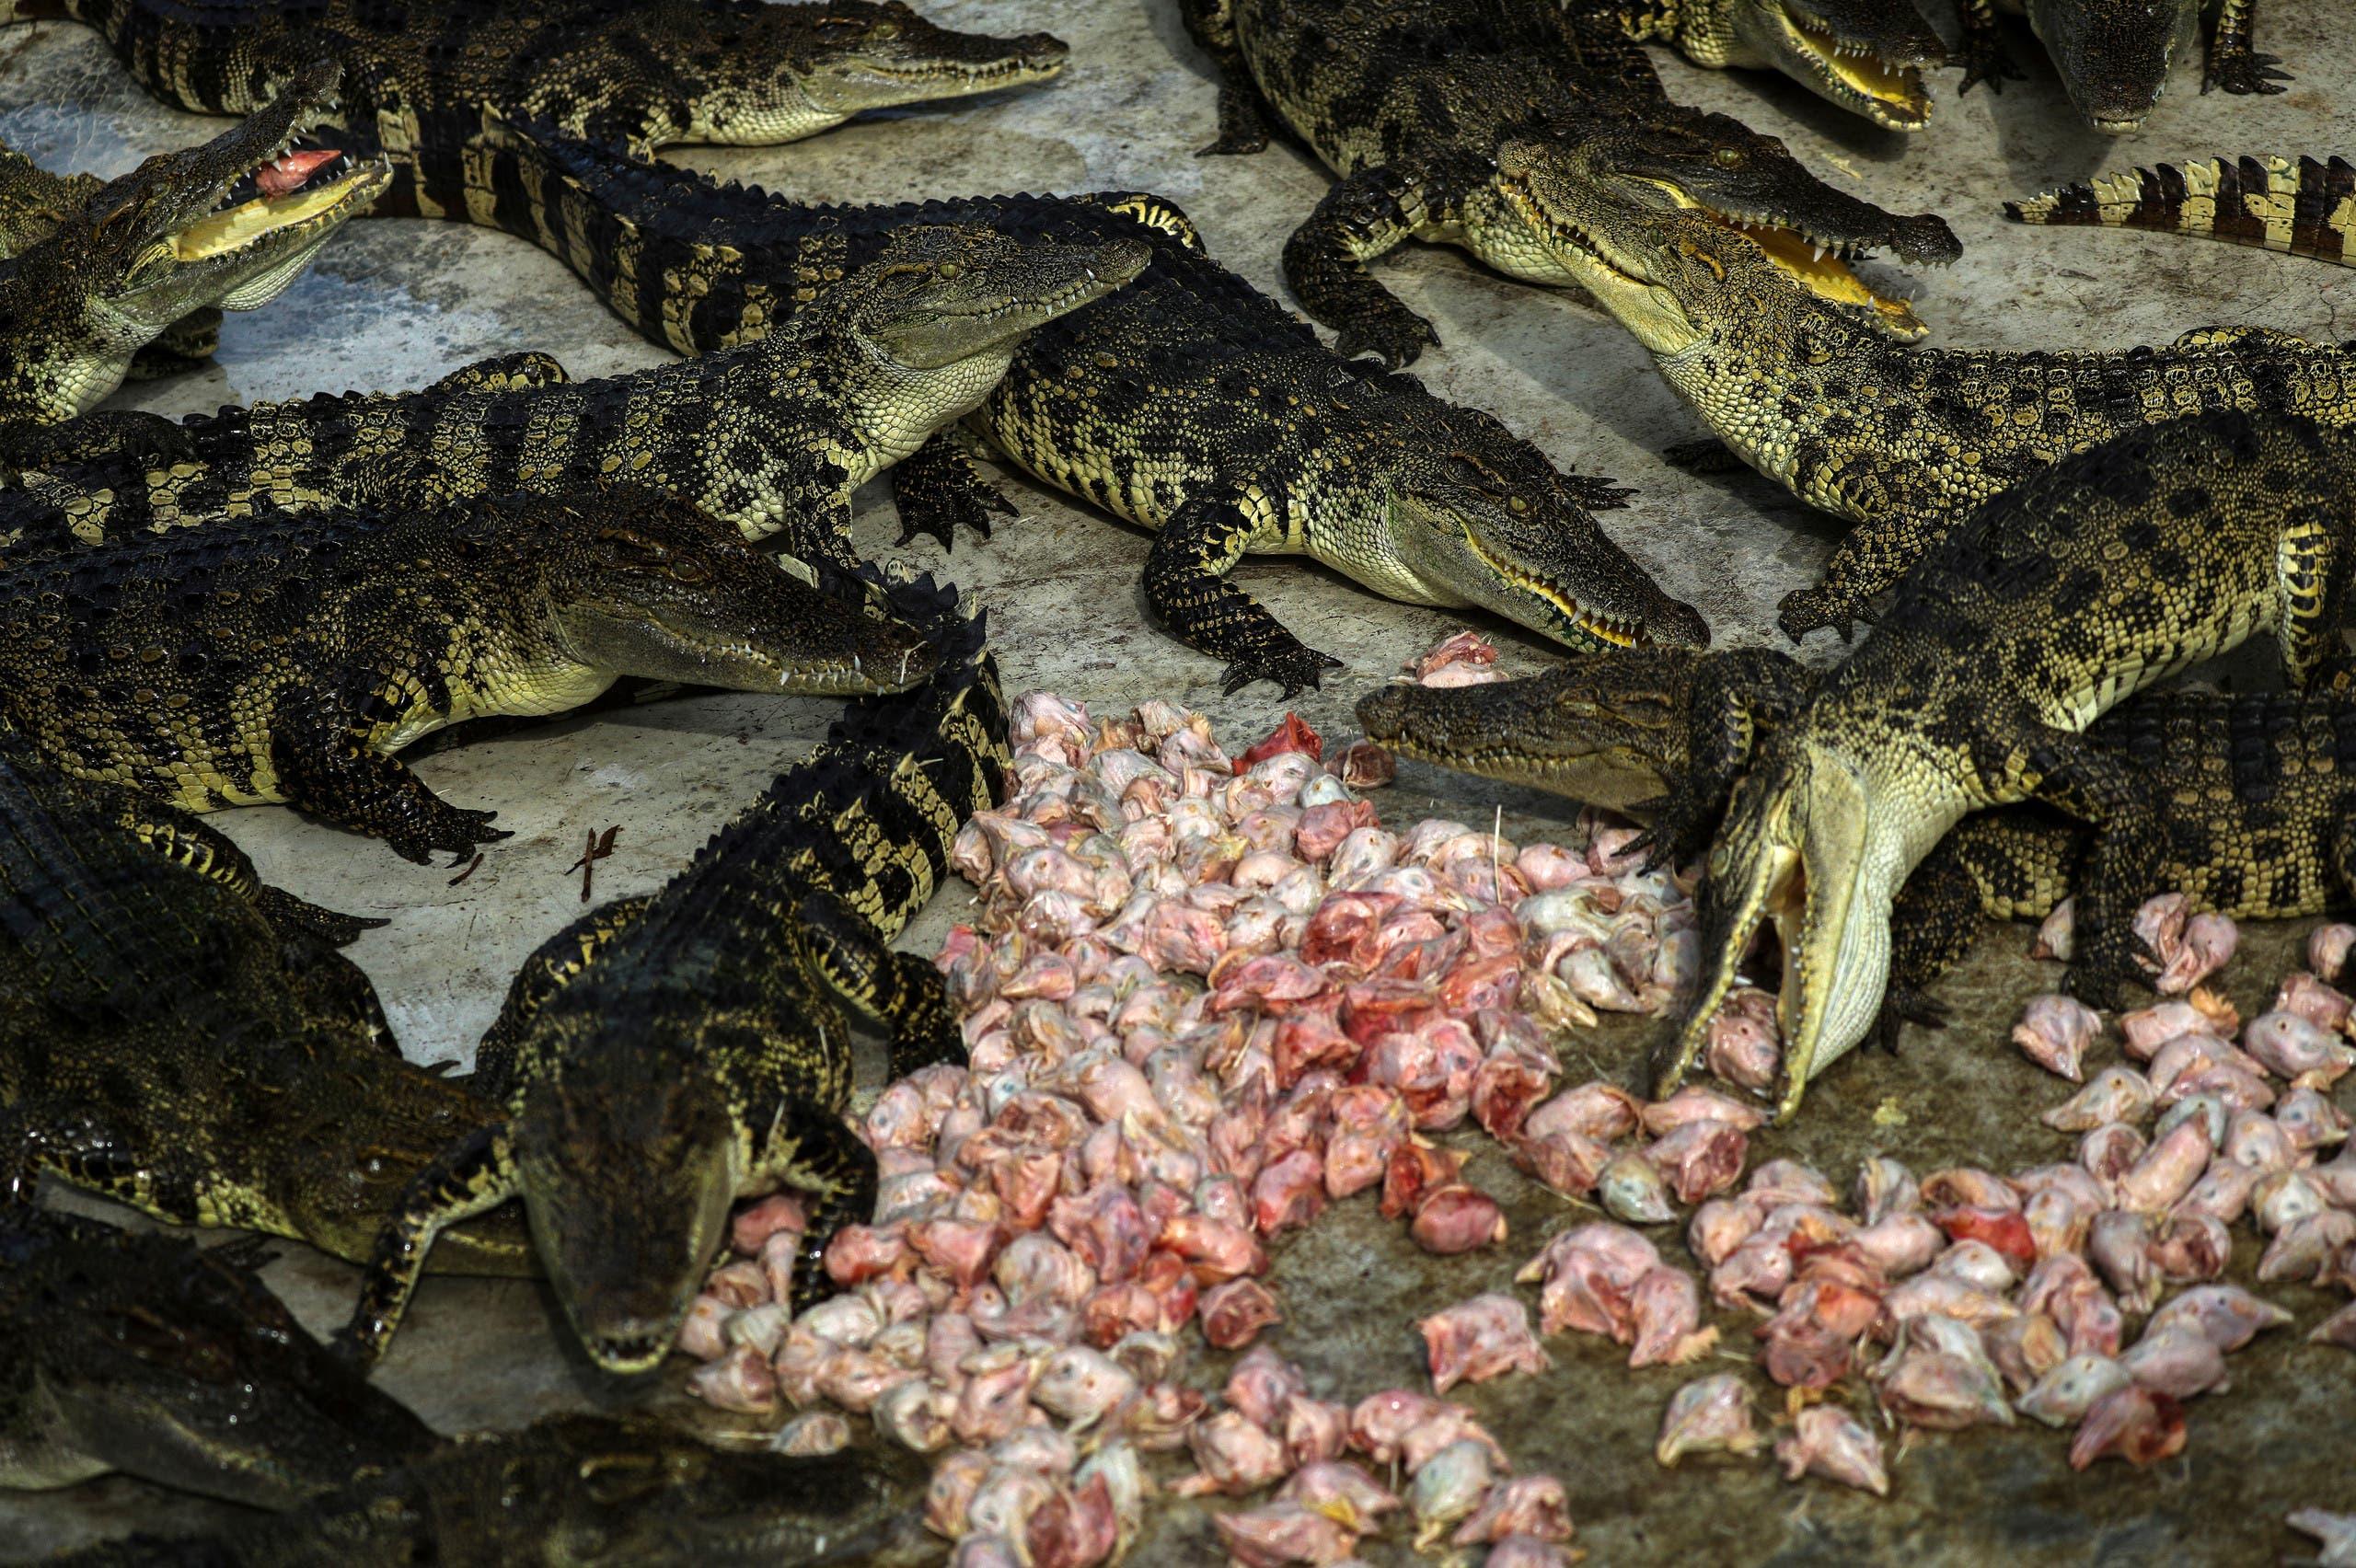 Thailand has the world's biggest crocodile farms